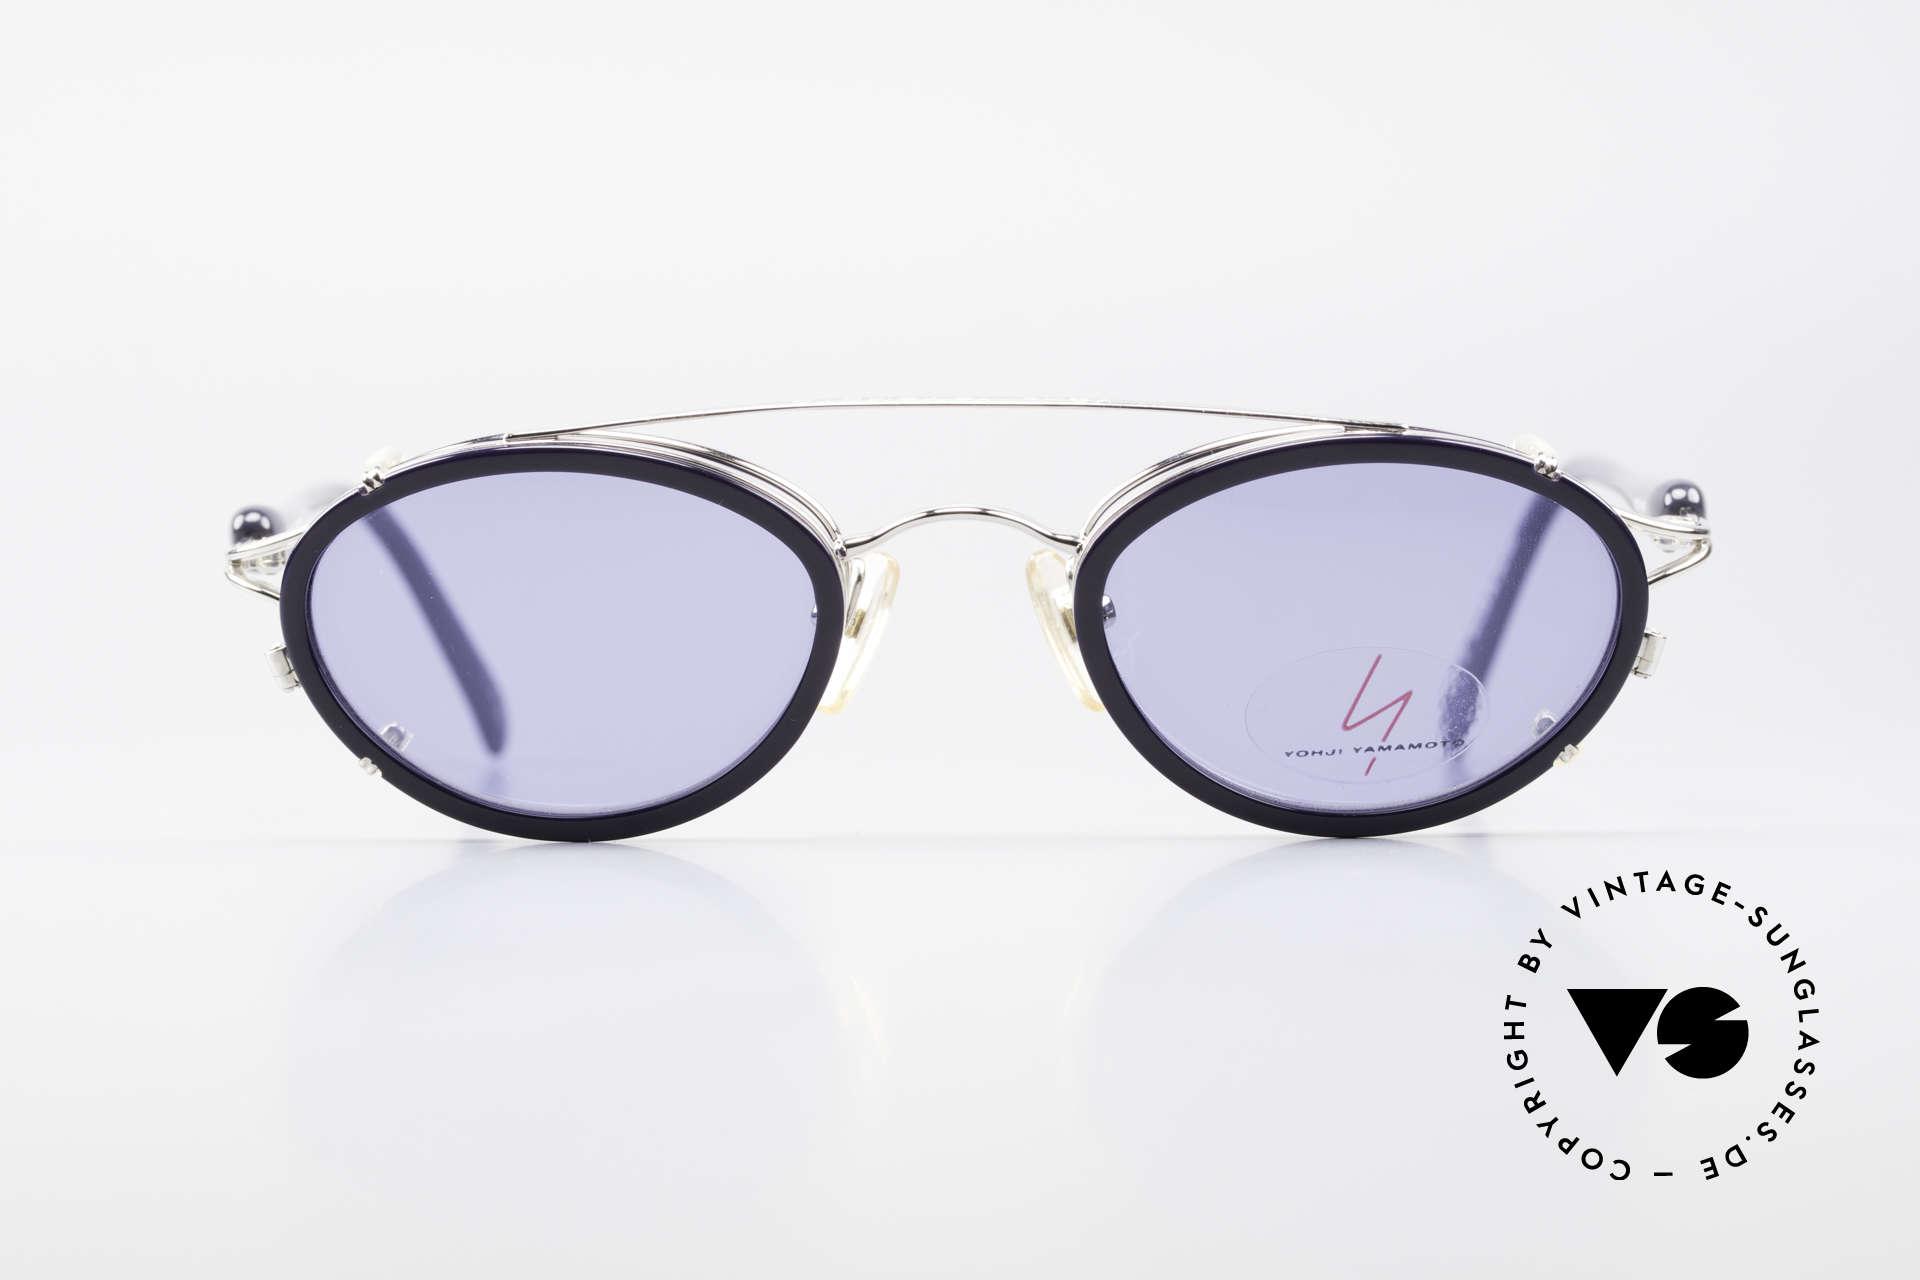 Yohji Yamamoto 51-7210 Clip-On 90's No Retro Shades, designer eyeglasses with practical sun clip; 100% UV, Made for Men and Women